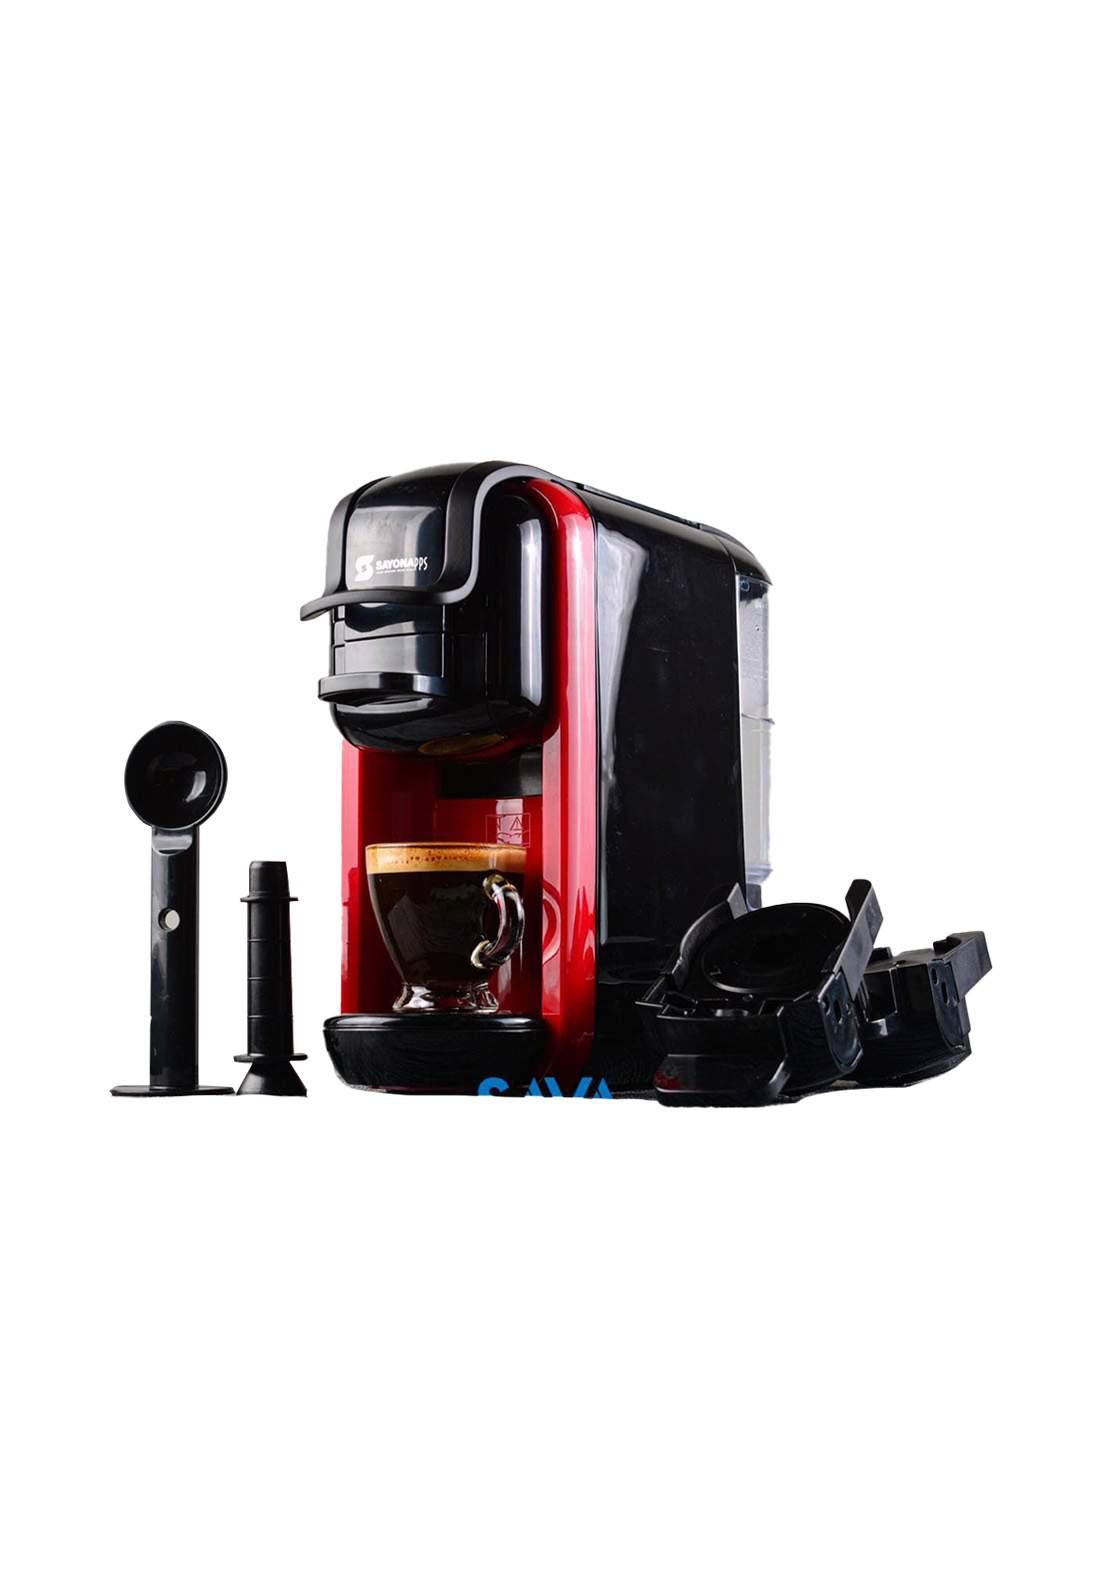 Sayona 4384  Coffee Machine 1450 Watt ماكنة صنع قهوة